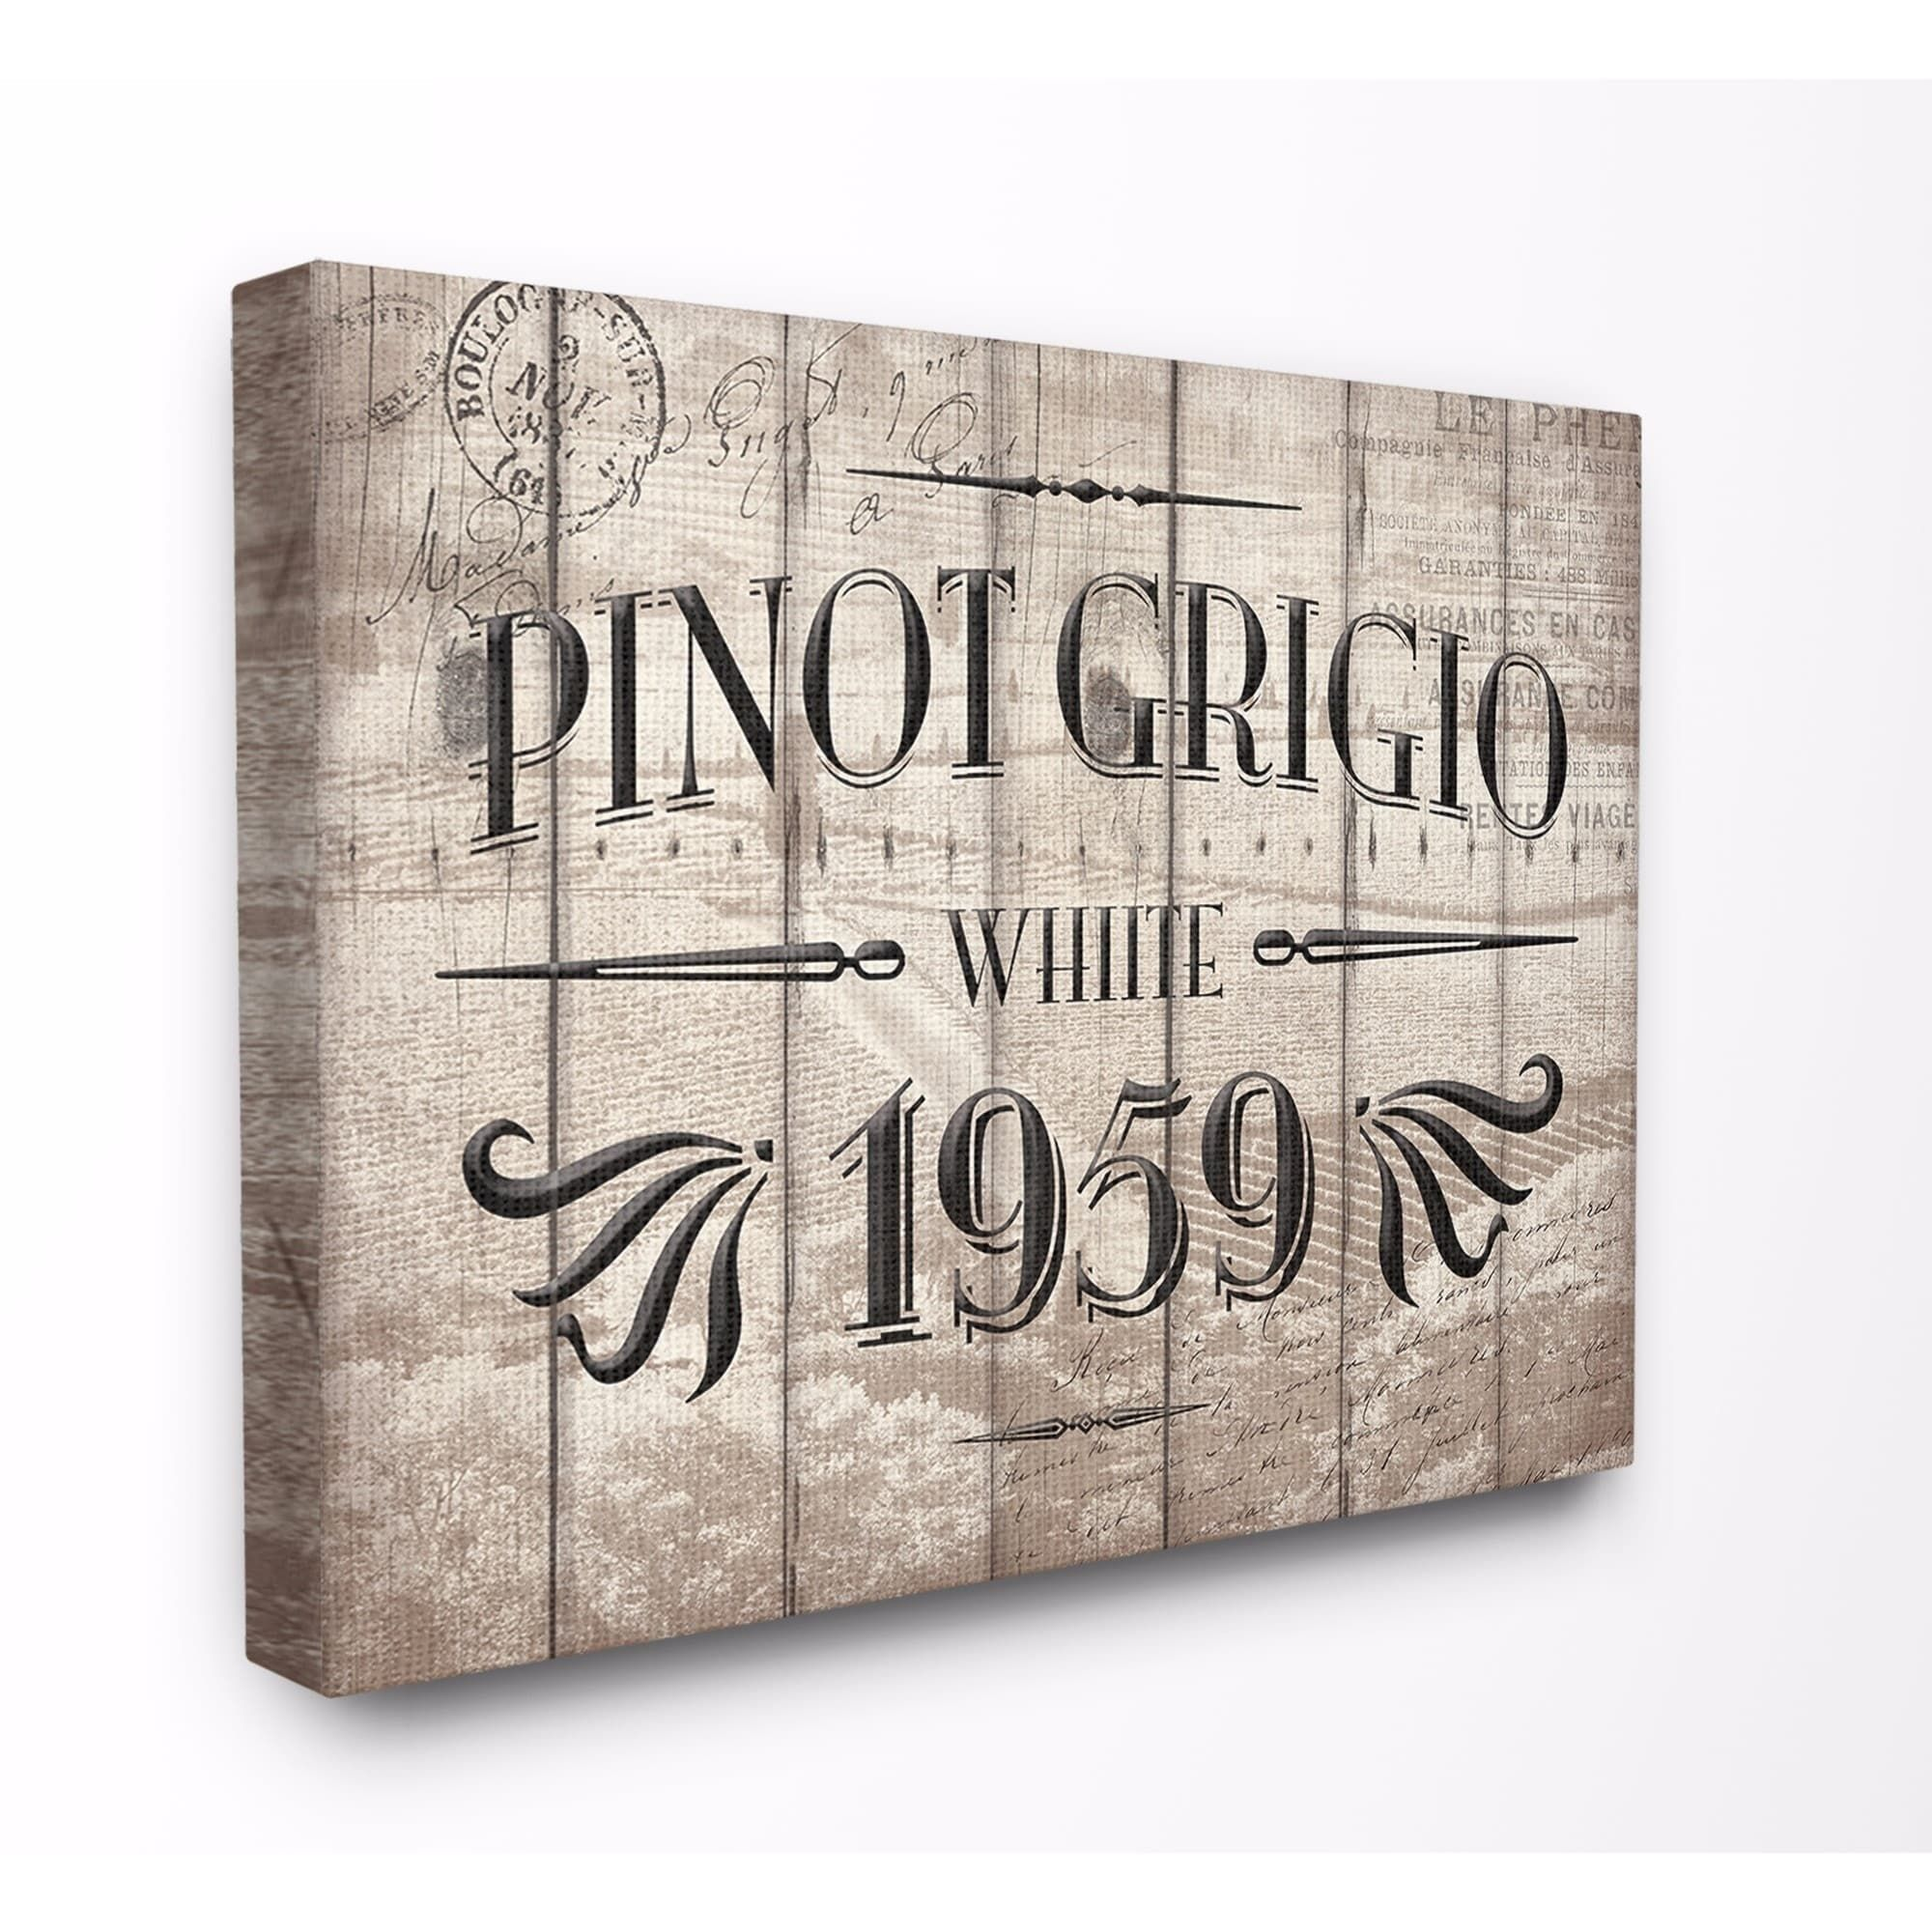 Stupell industries pinot grigio label wine red kitchen wall art